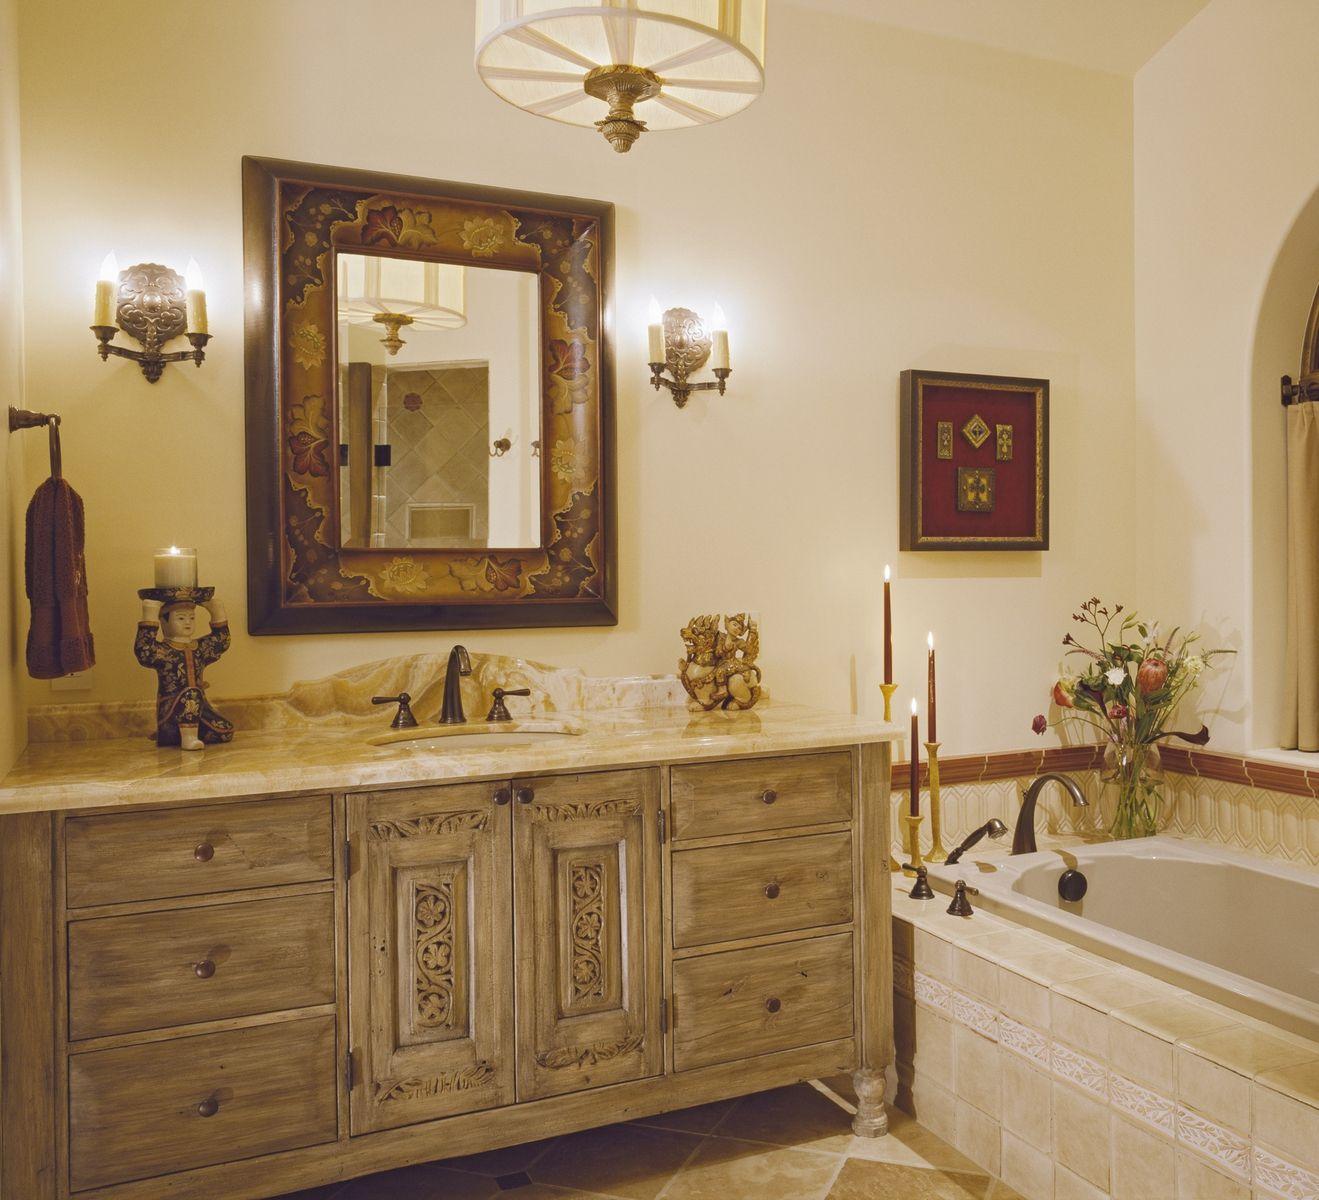 Custom Bathroom Vanities For Sale hand made bathroom vanity cabinetry : 2nd master bathtilde